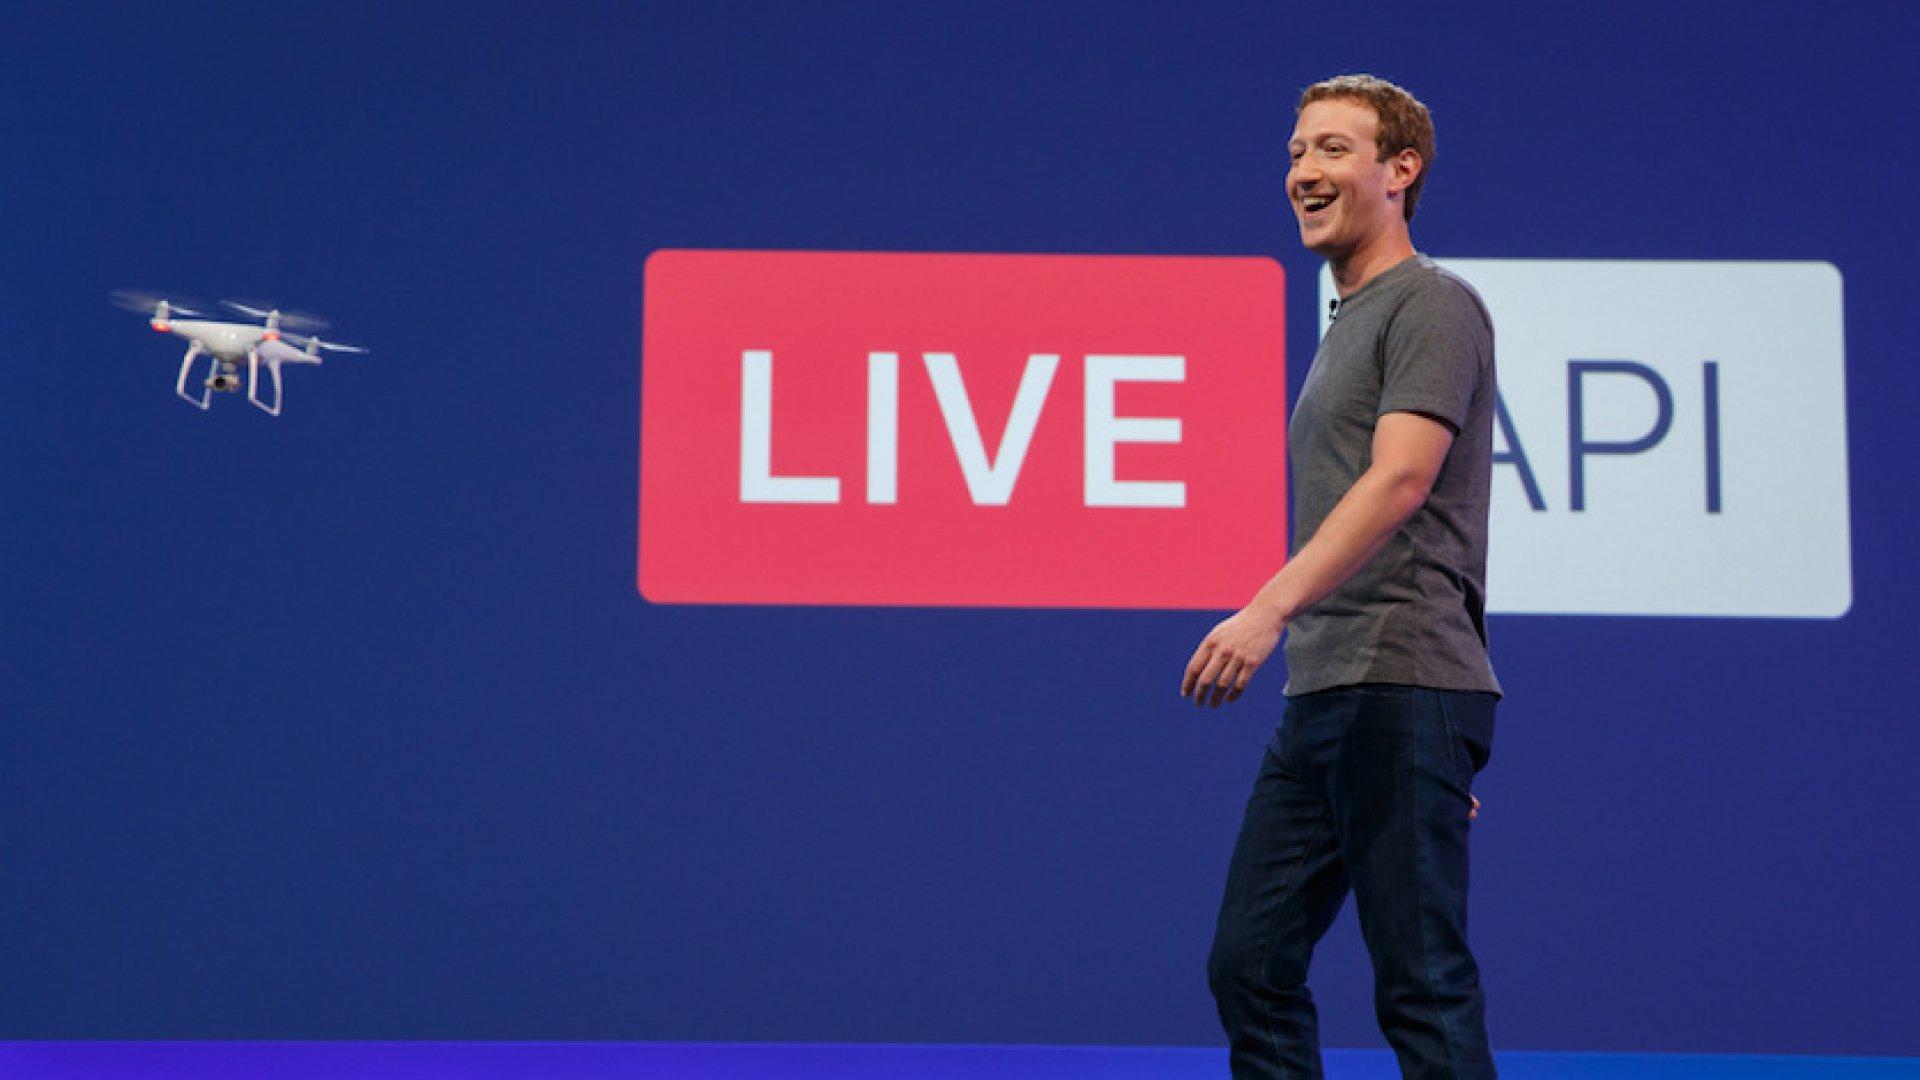 Mark Zuckerberg presenting during Facebook's 2016 F8 developer day.